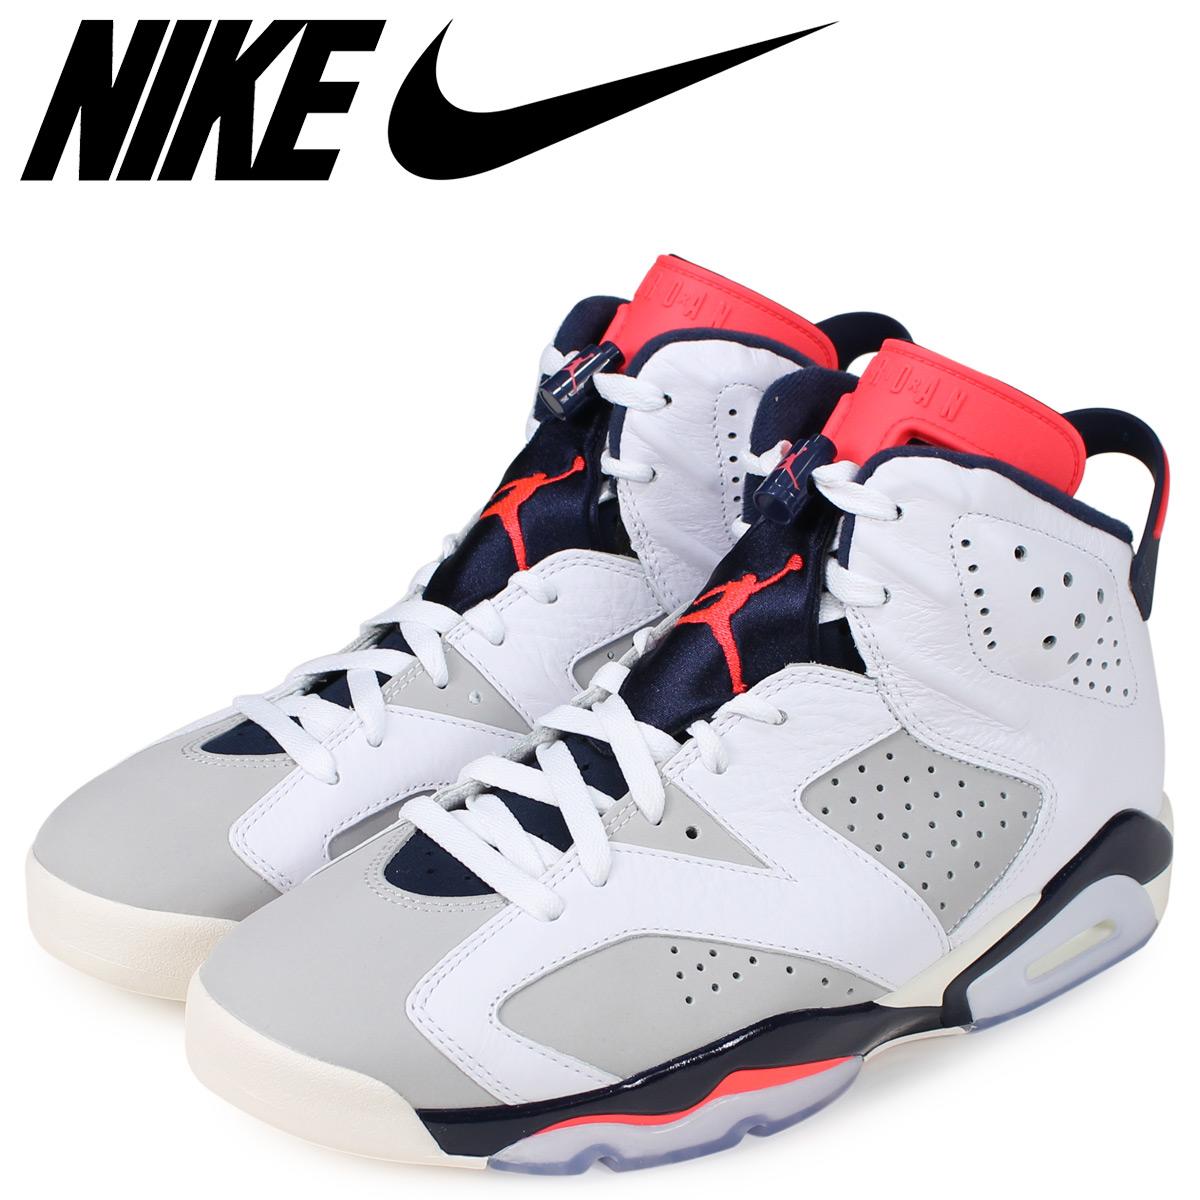 the best attitude 2ac61 5f777 NIKE Nike Air Jordan 6 nostalgic sneakers men AIR JORDAN 6 RETRO TINKER  white white 384,664-104